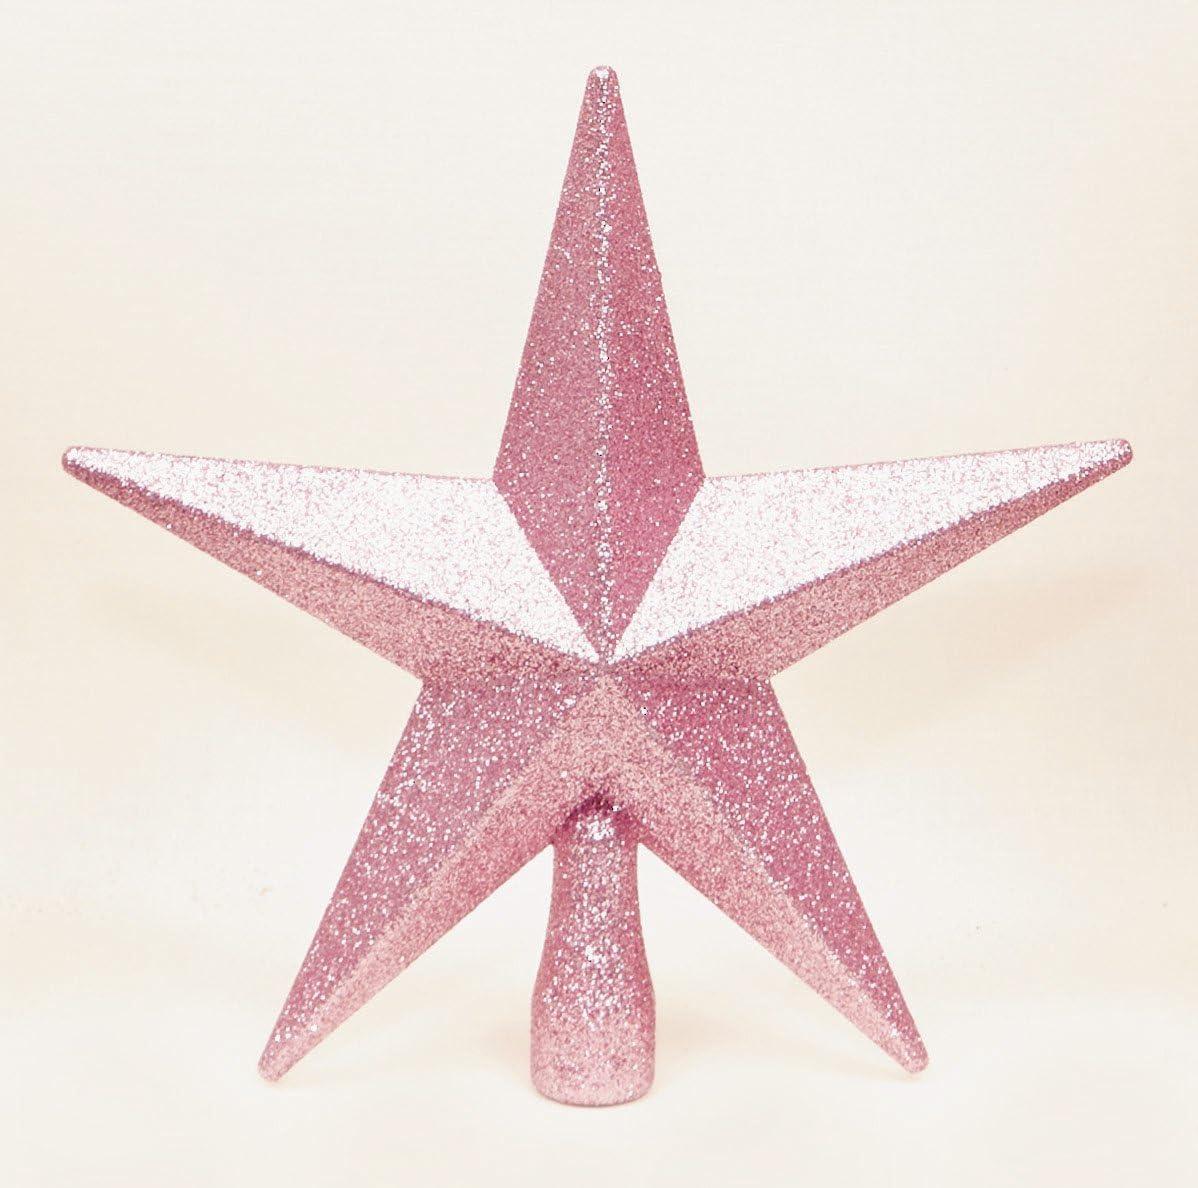 Rose Christmas Tree Top Star Topper Glitter finition 20cm